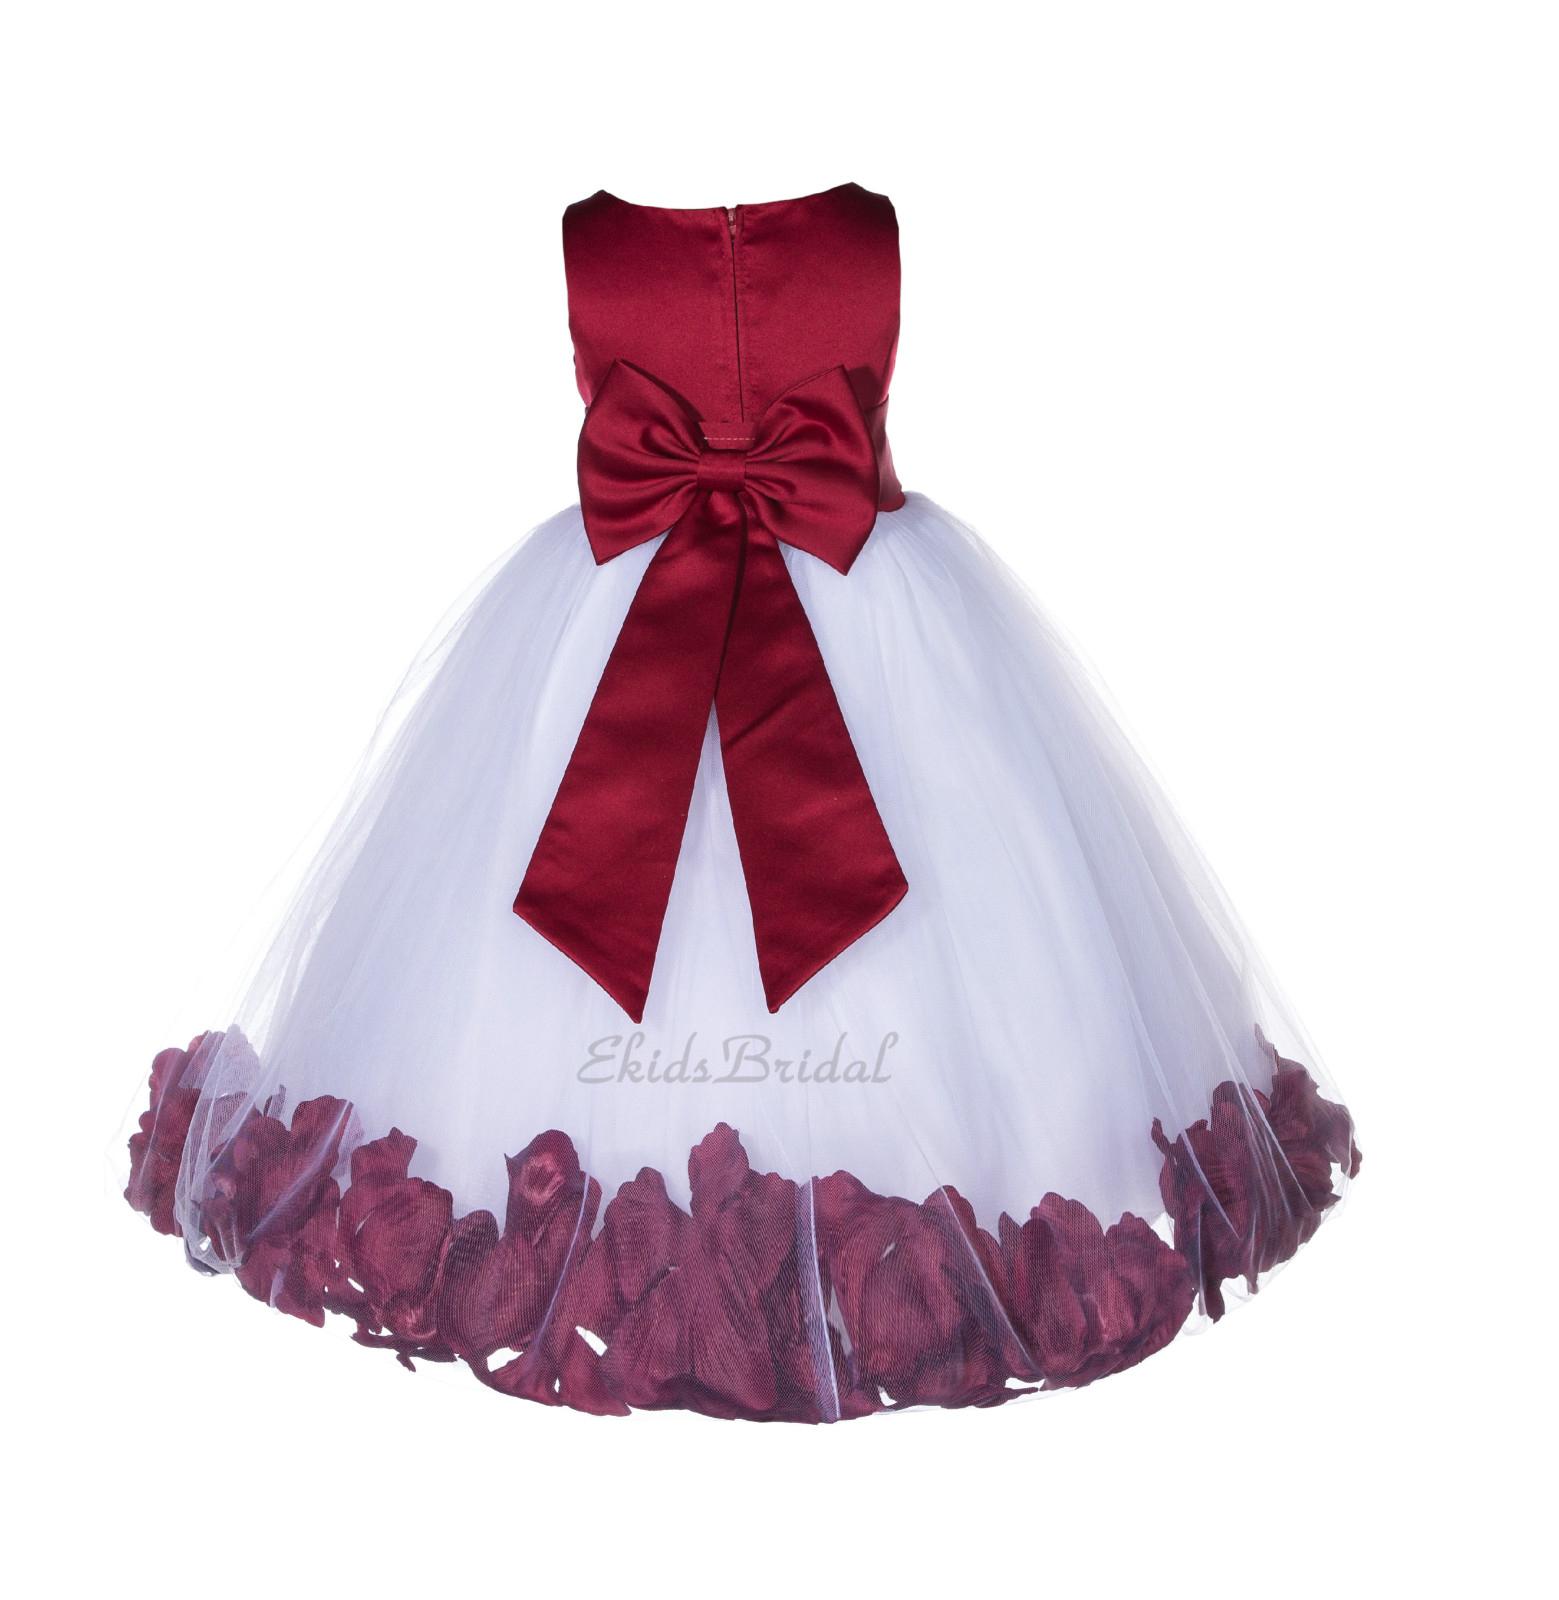 Floral Tulle Rose Petal Flower Girl Dress and 50 similar items